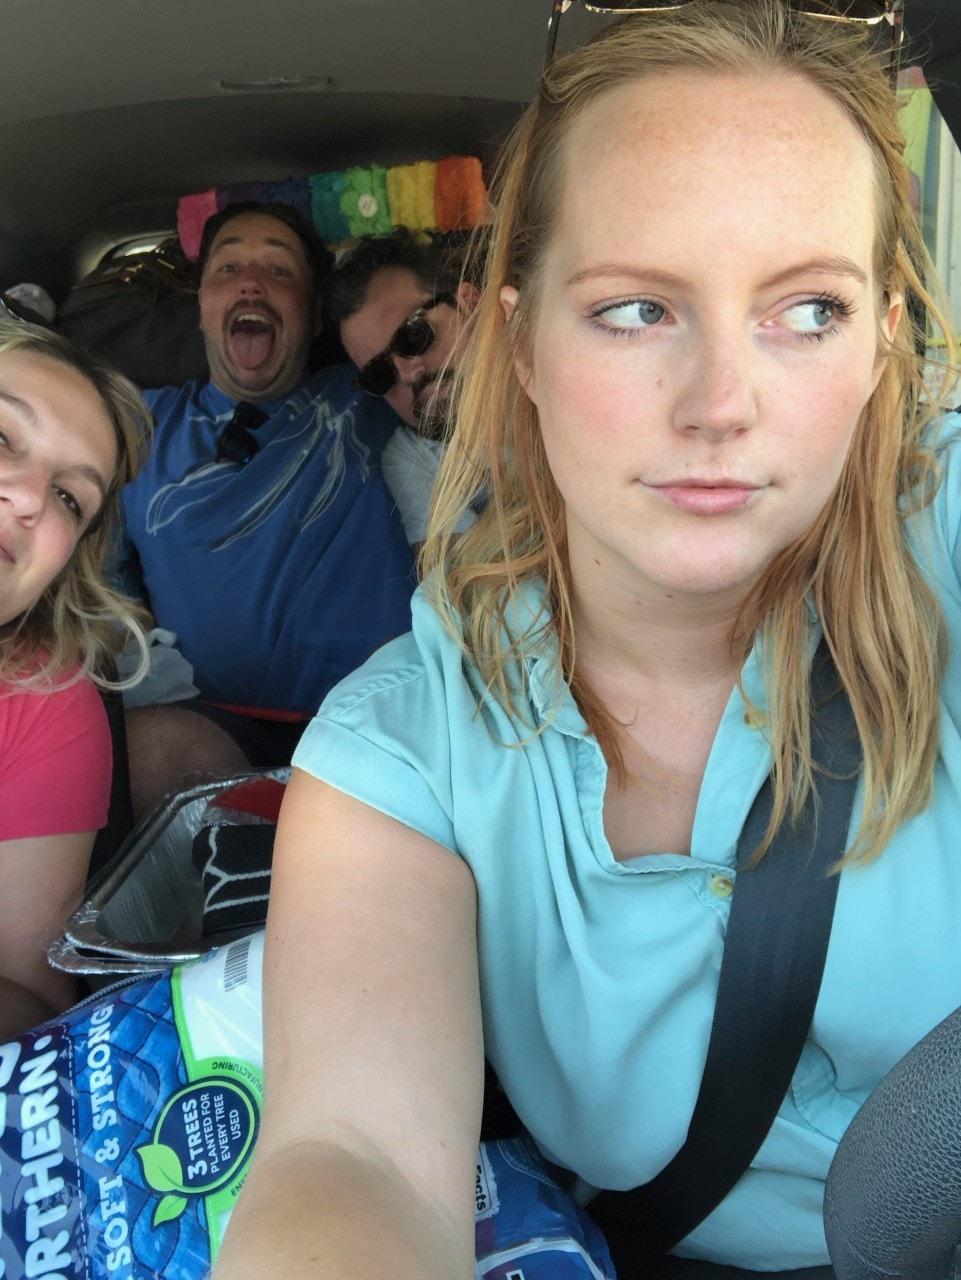 cameron driving